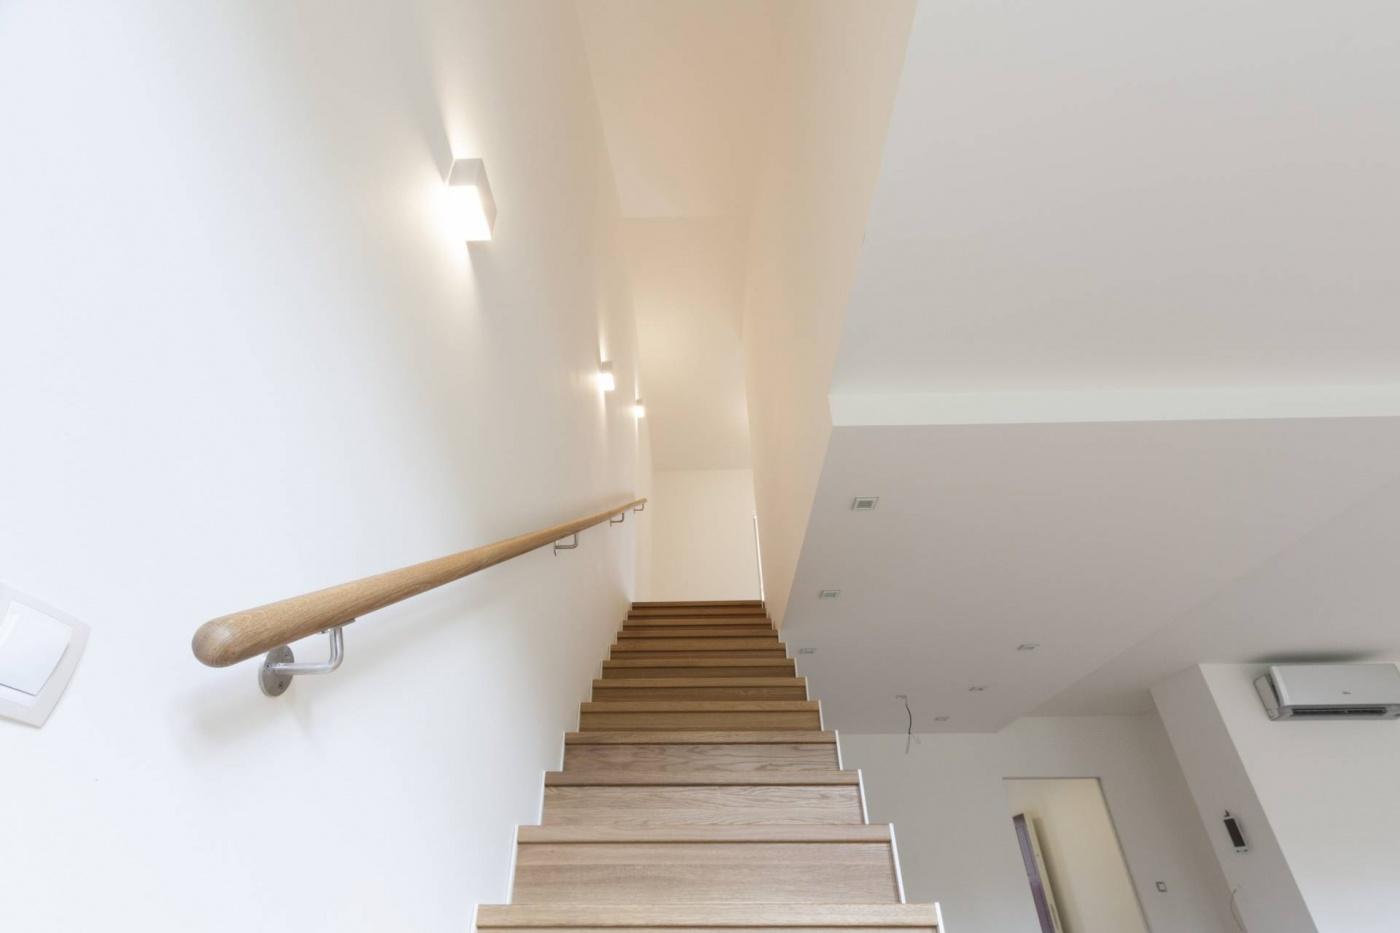 Půdní byt 3+kk, plocha 109 m², ulice Lumírova, Praha 2 - Vyšehrad, cena 8 950 000 Kč | 19